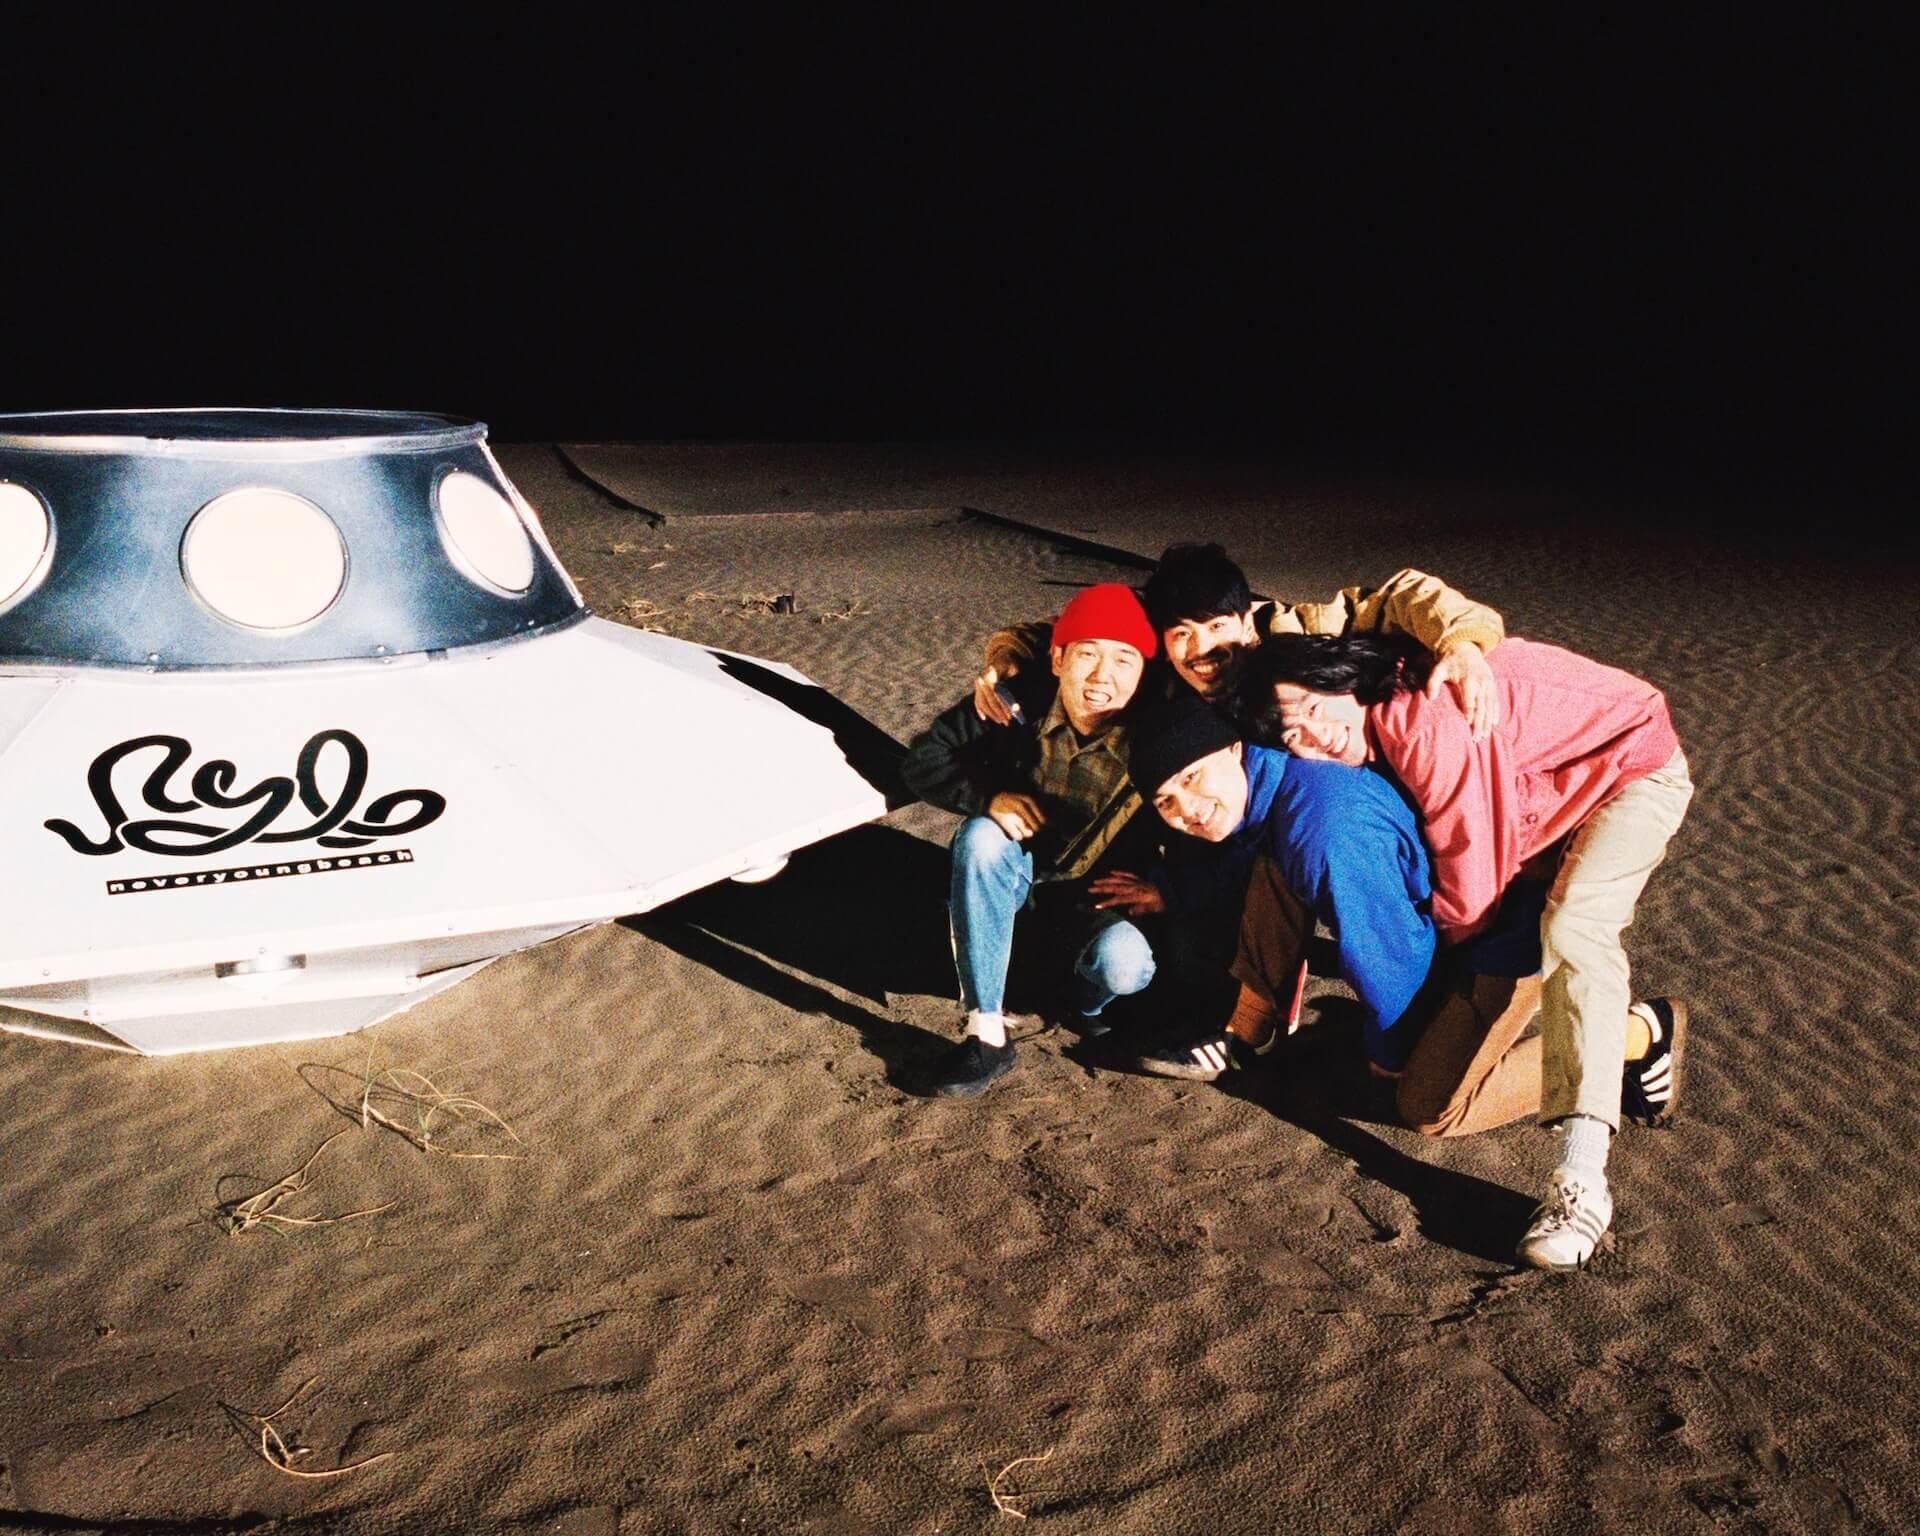 never young beachが高橋一生&蒼井優主演映画『ロマンスドール』主題歌書き下ろし&劇中歌担当|本人コメントも到着 music191023_neveryoungbeach_01